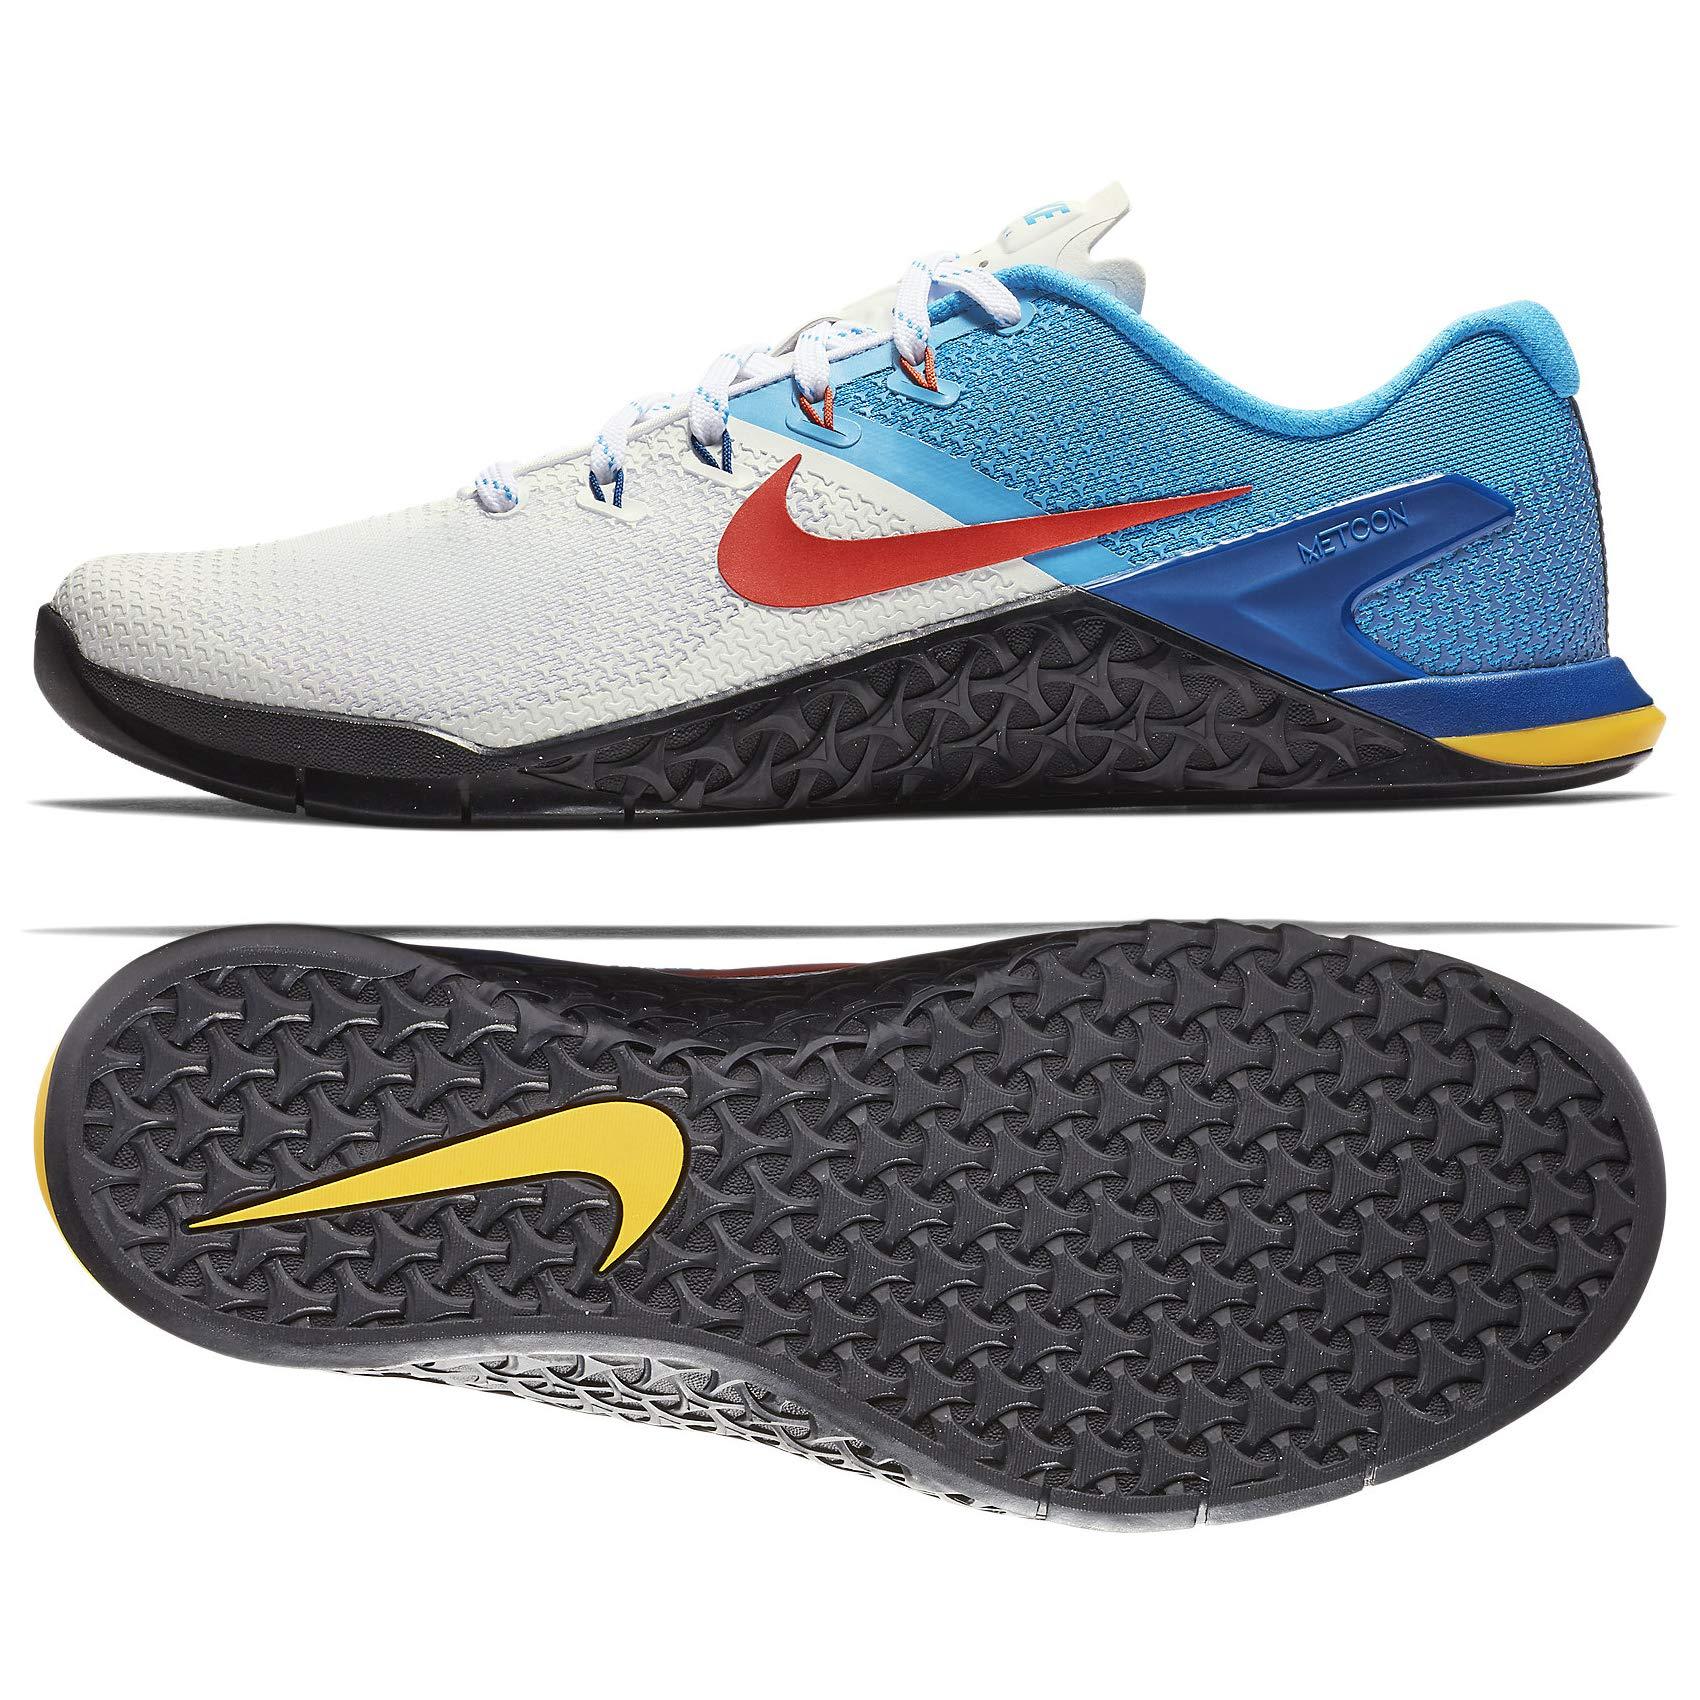 Nike Metcon 4 AH7453-184 White/Team Orange/Blue Hero/Gym Blue Men's Training Shoes (9.5)